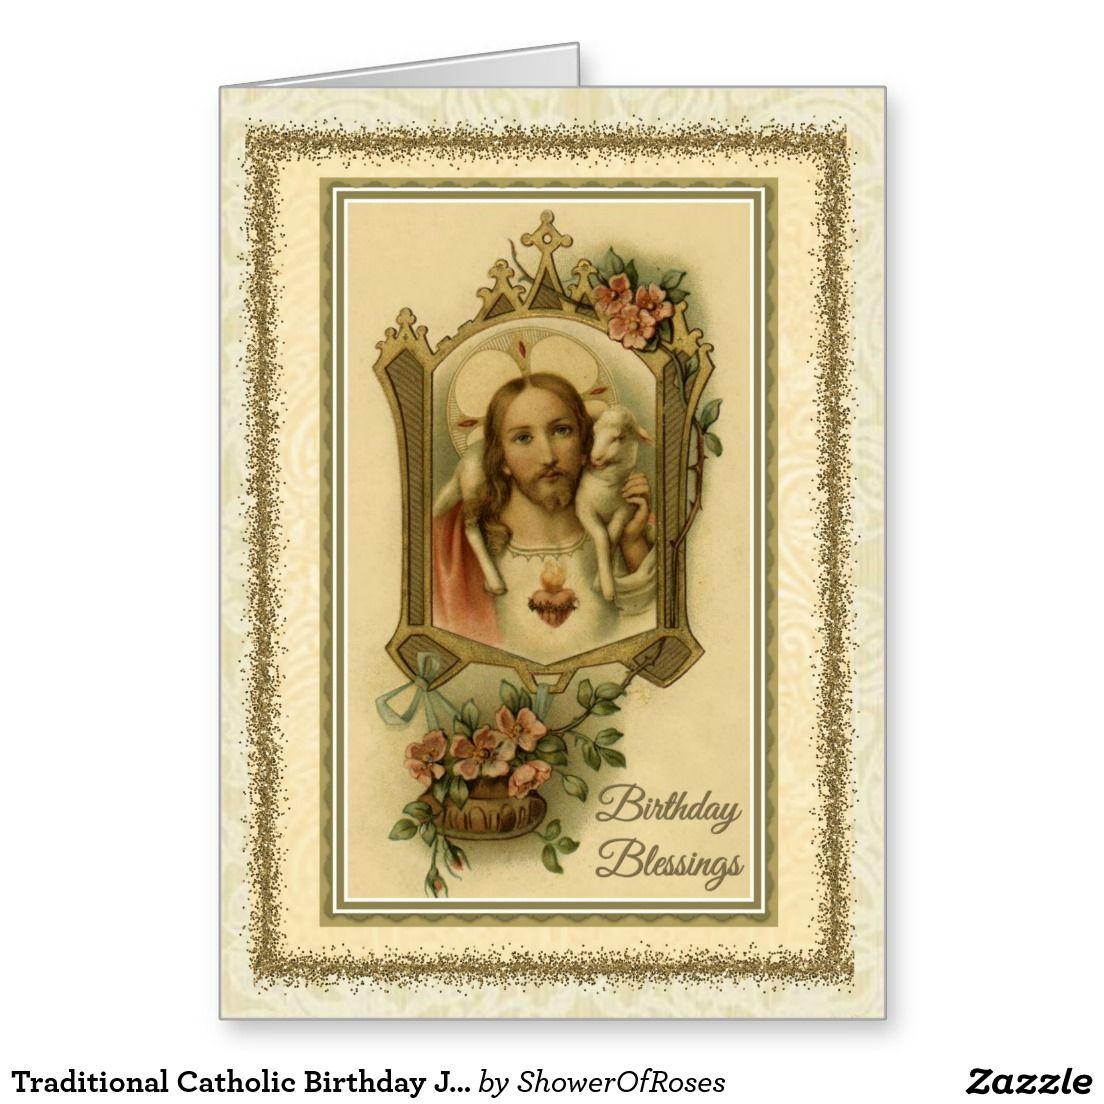 Traditional Catholic Birthday Jesus Blessing Card | BIRTHDAY CARDS ...